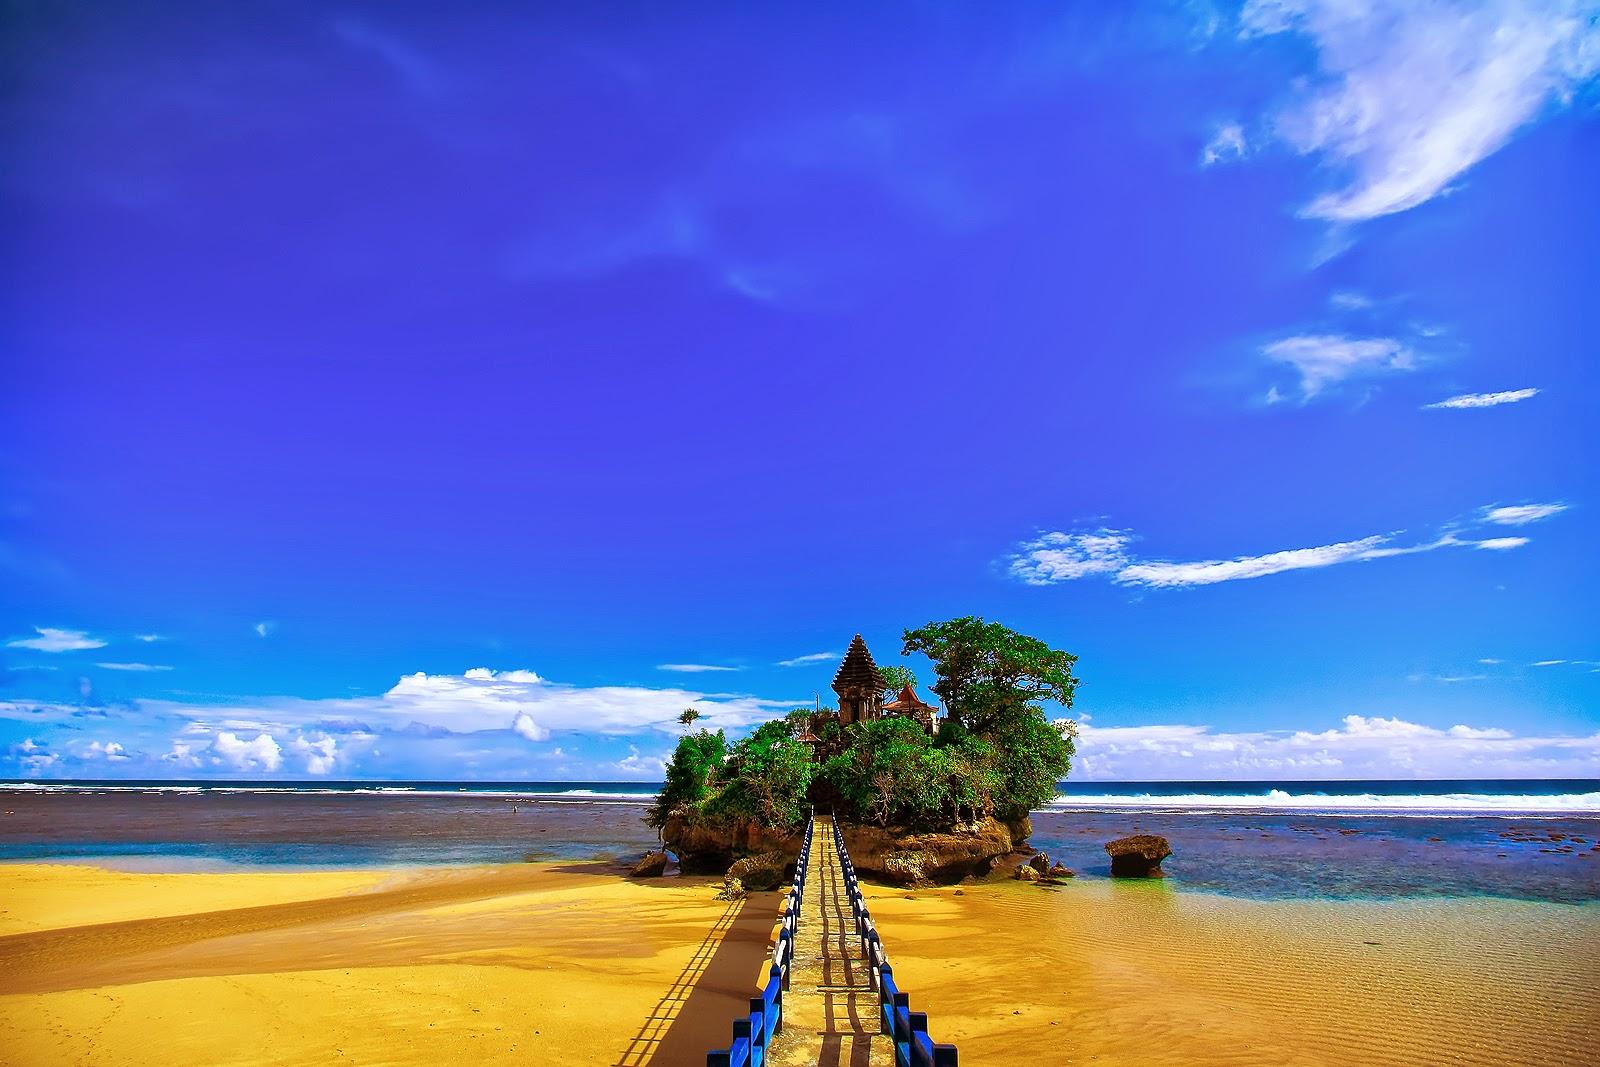 Wisata Pantai Balekambang Malang | Aneka Wisata Nusantara